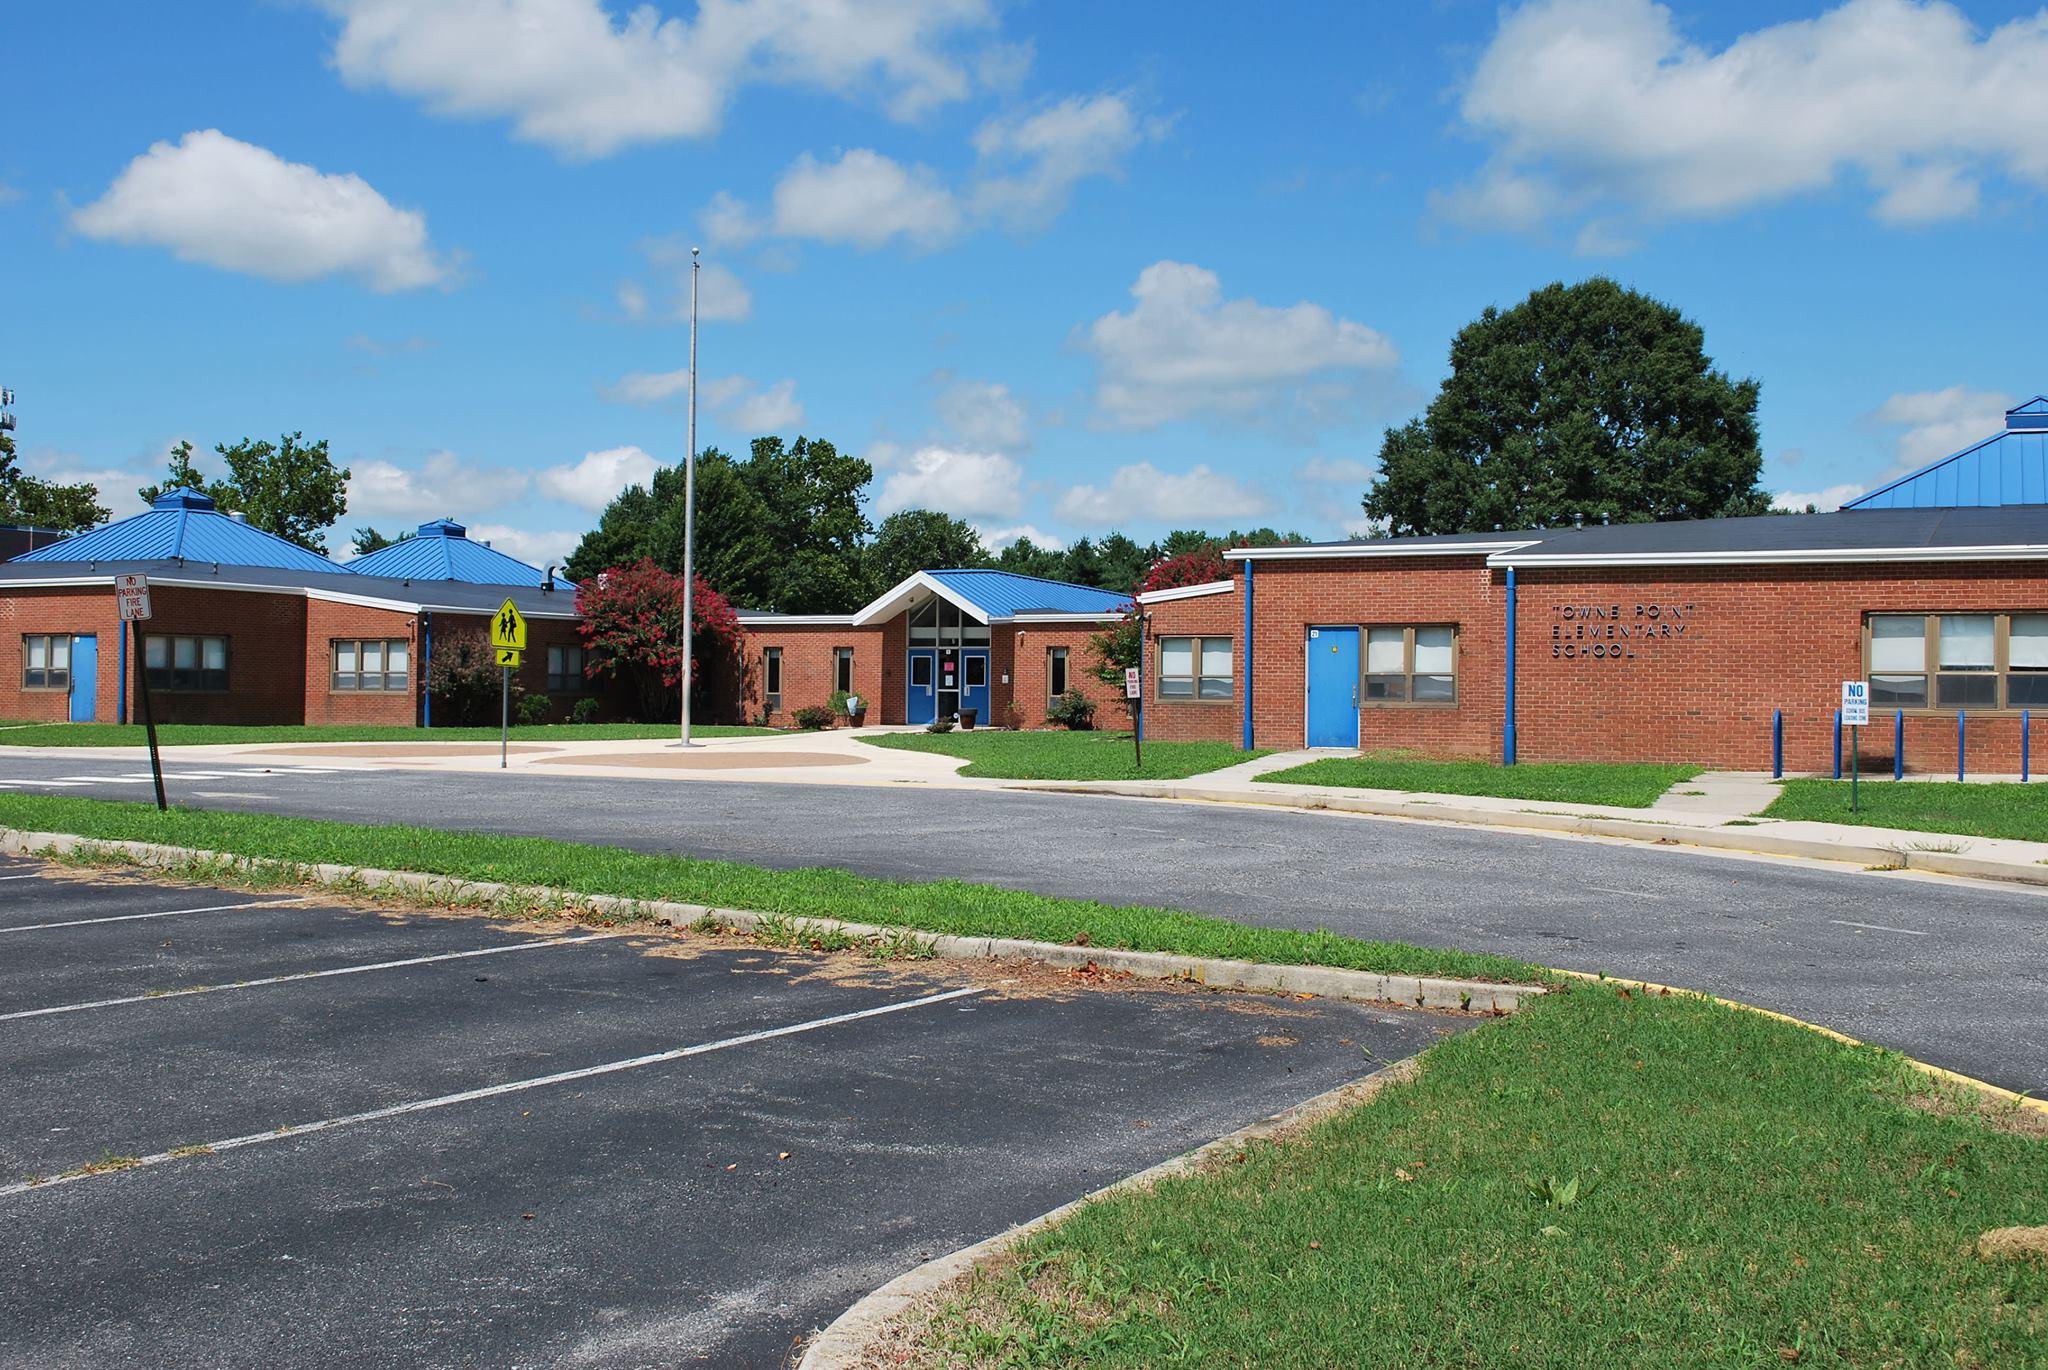 Towne Point Elementary School